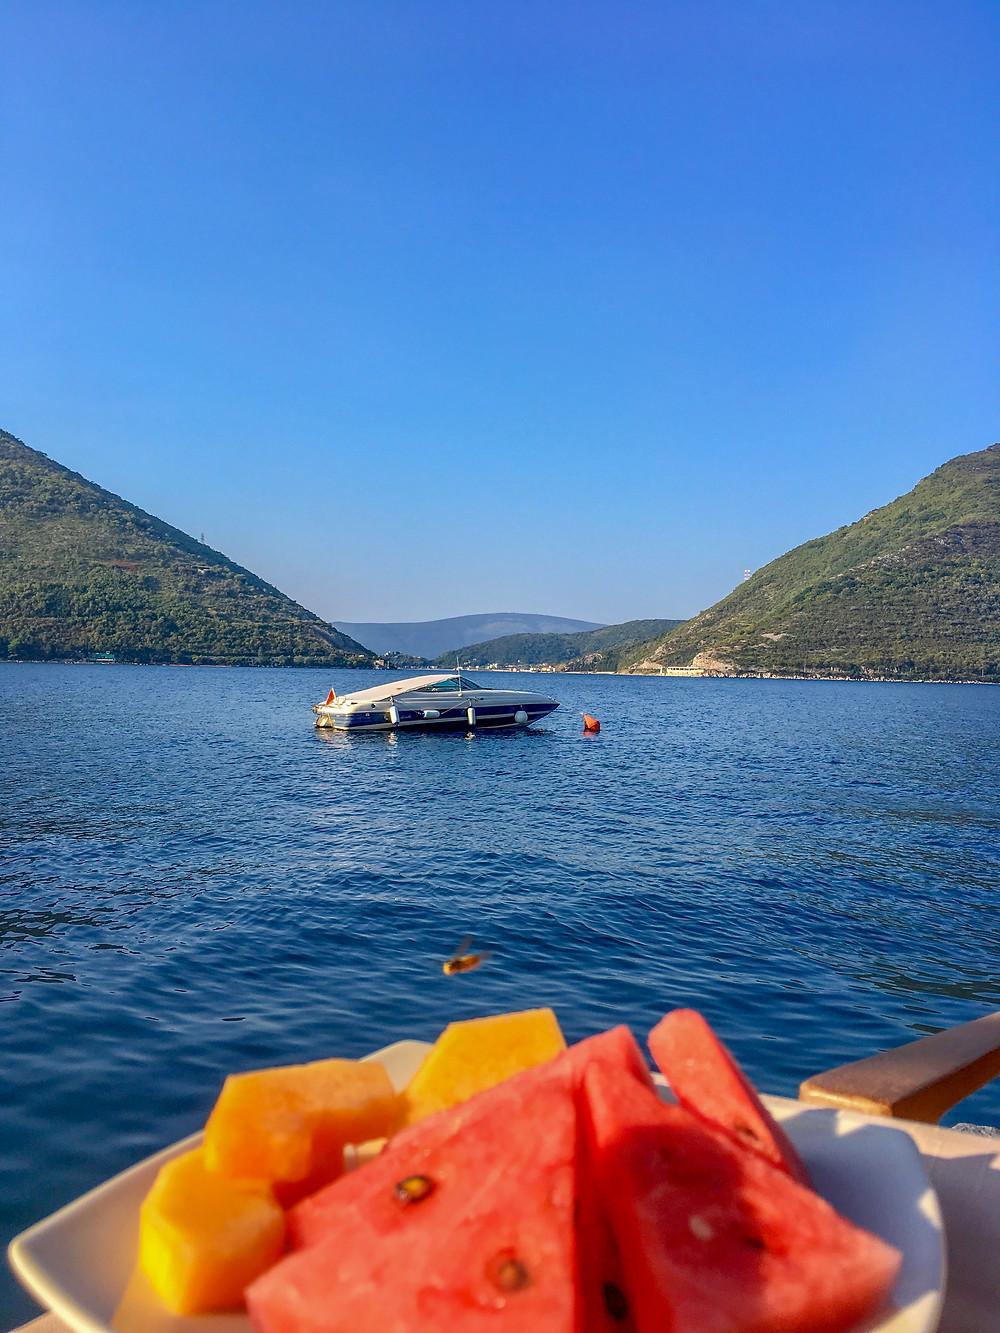 Breakfast at Hotel Conte, Perast Montenegro